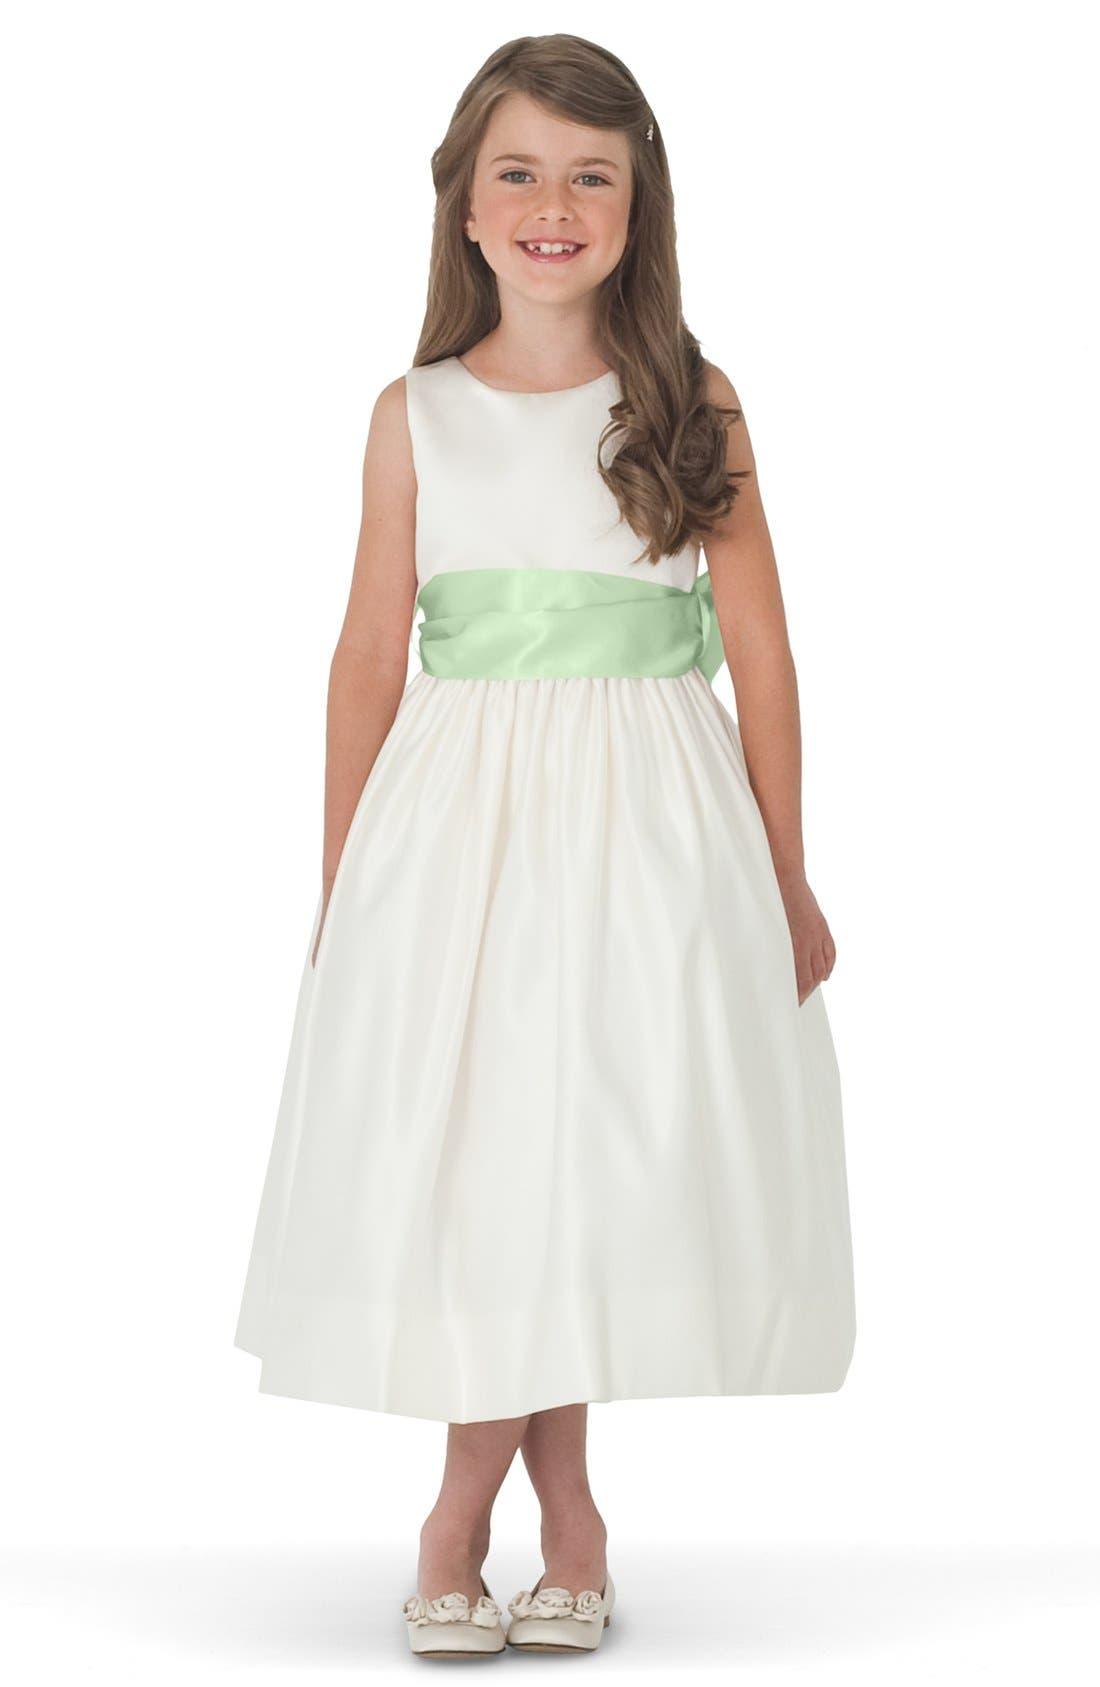 Sleeveless Satin Dress with Contrast Sash,                         Main,                         color, Ivory/ Mint